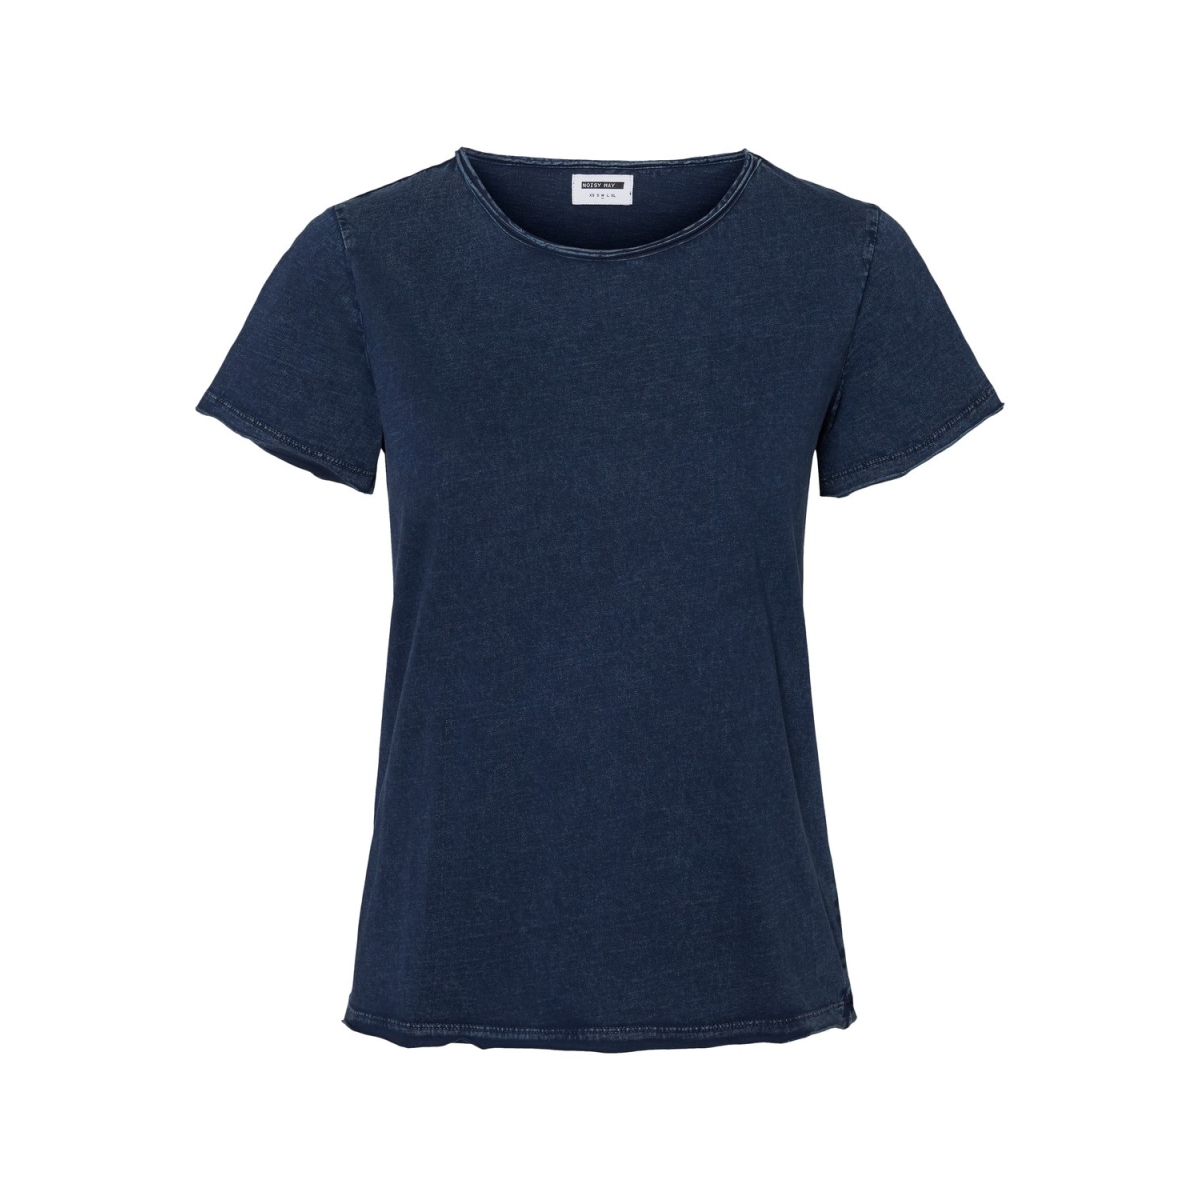 nmnaya nate s/s washed top color 27010085 noisy may t-shirt mood indigo